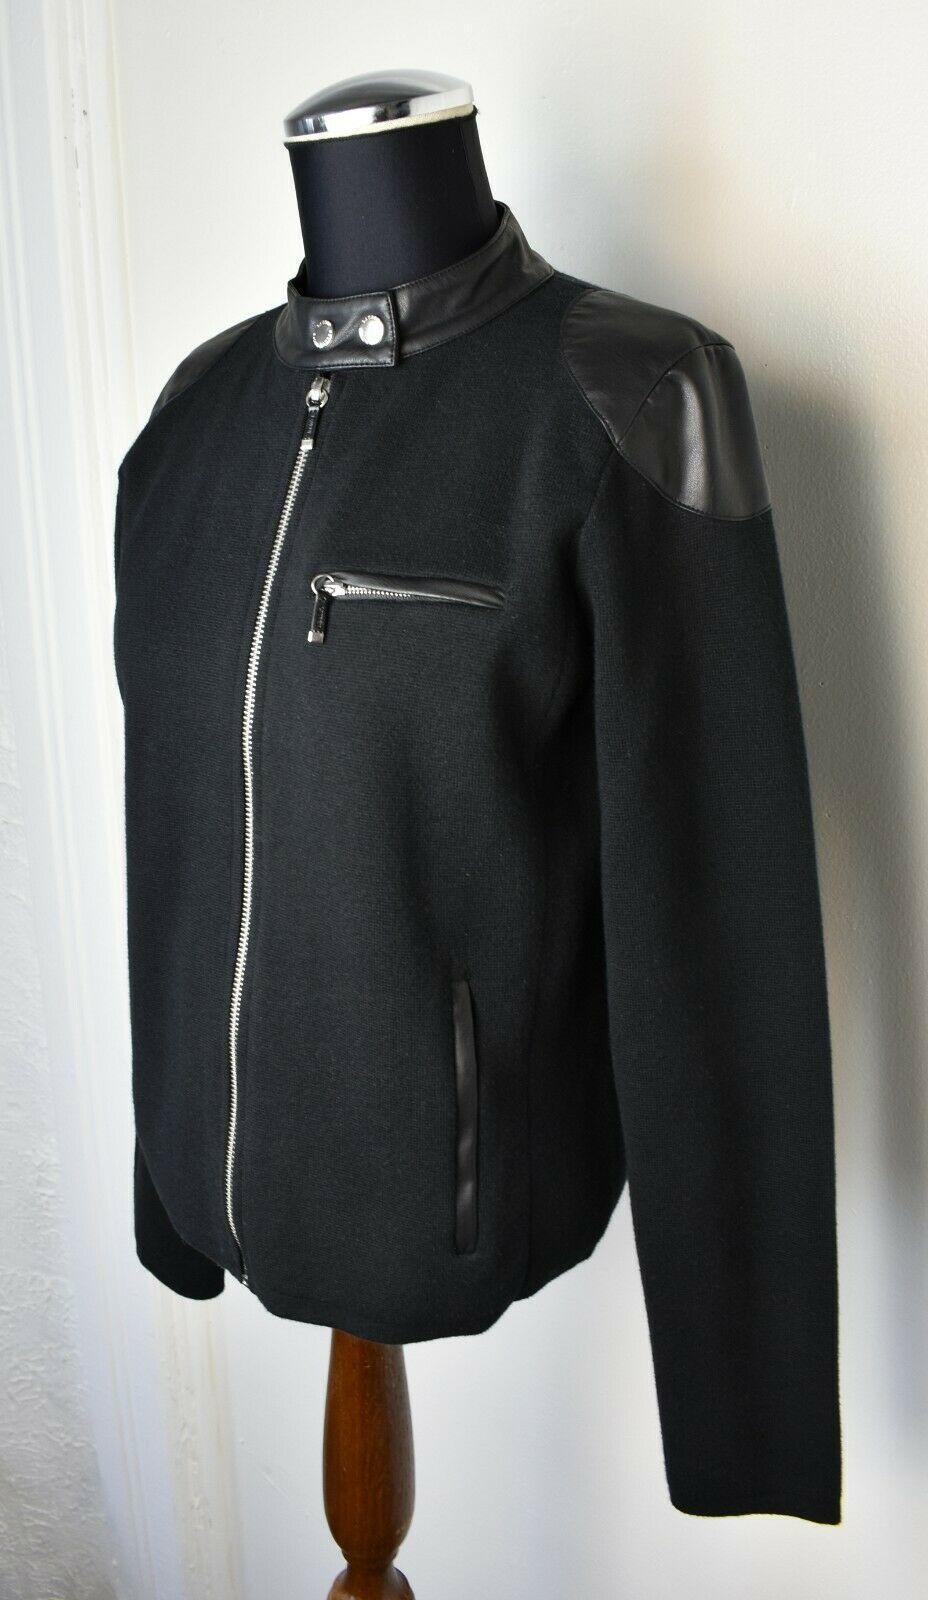 Ralph Lauren Black Faux Leather Trim Zip Front Motorcycle Jacket - Women's P/M - $37.95